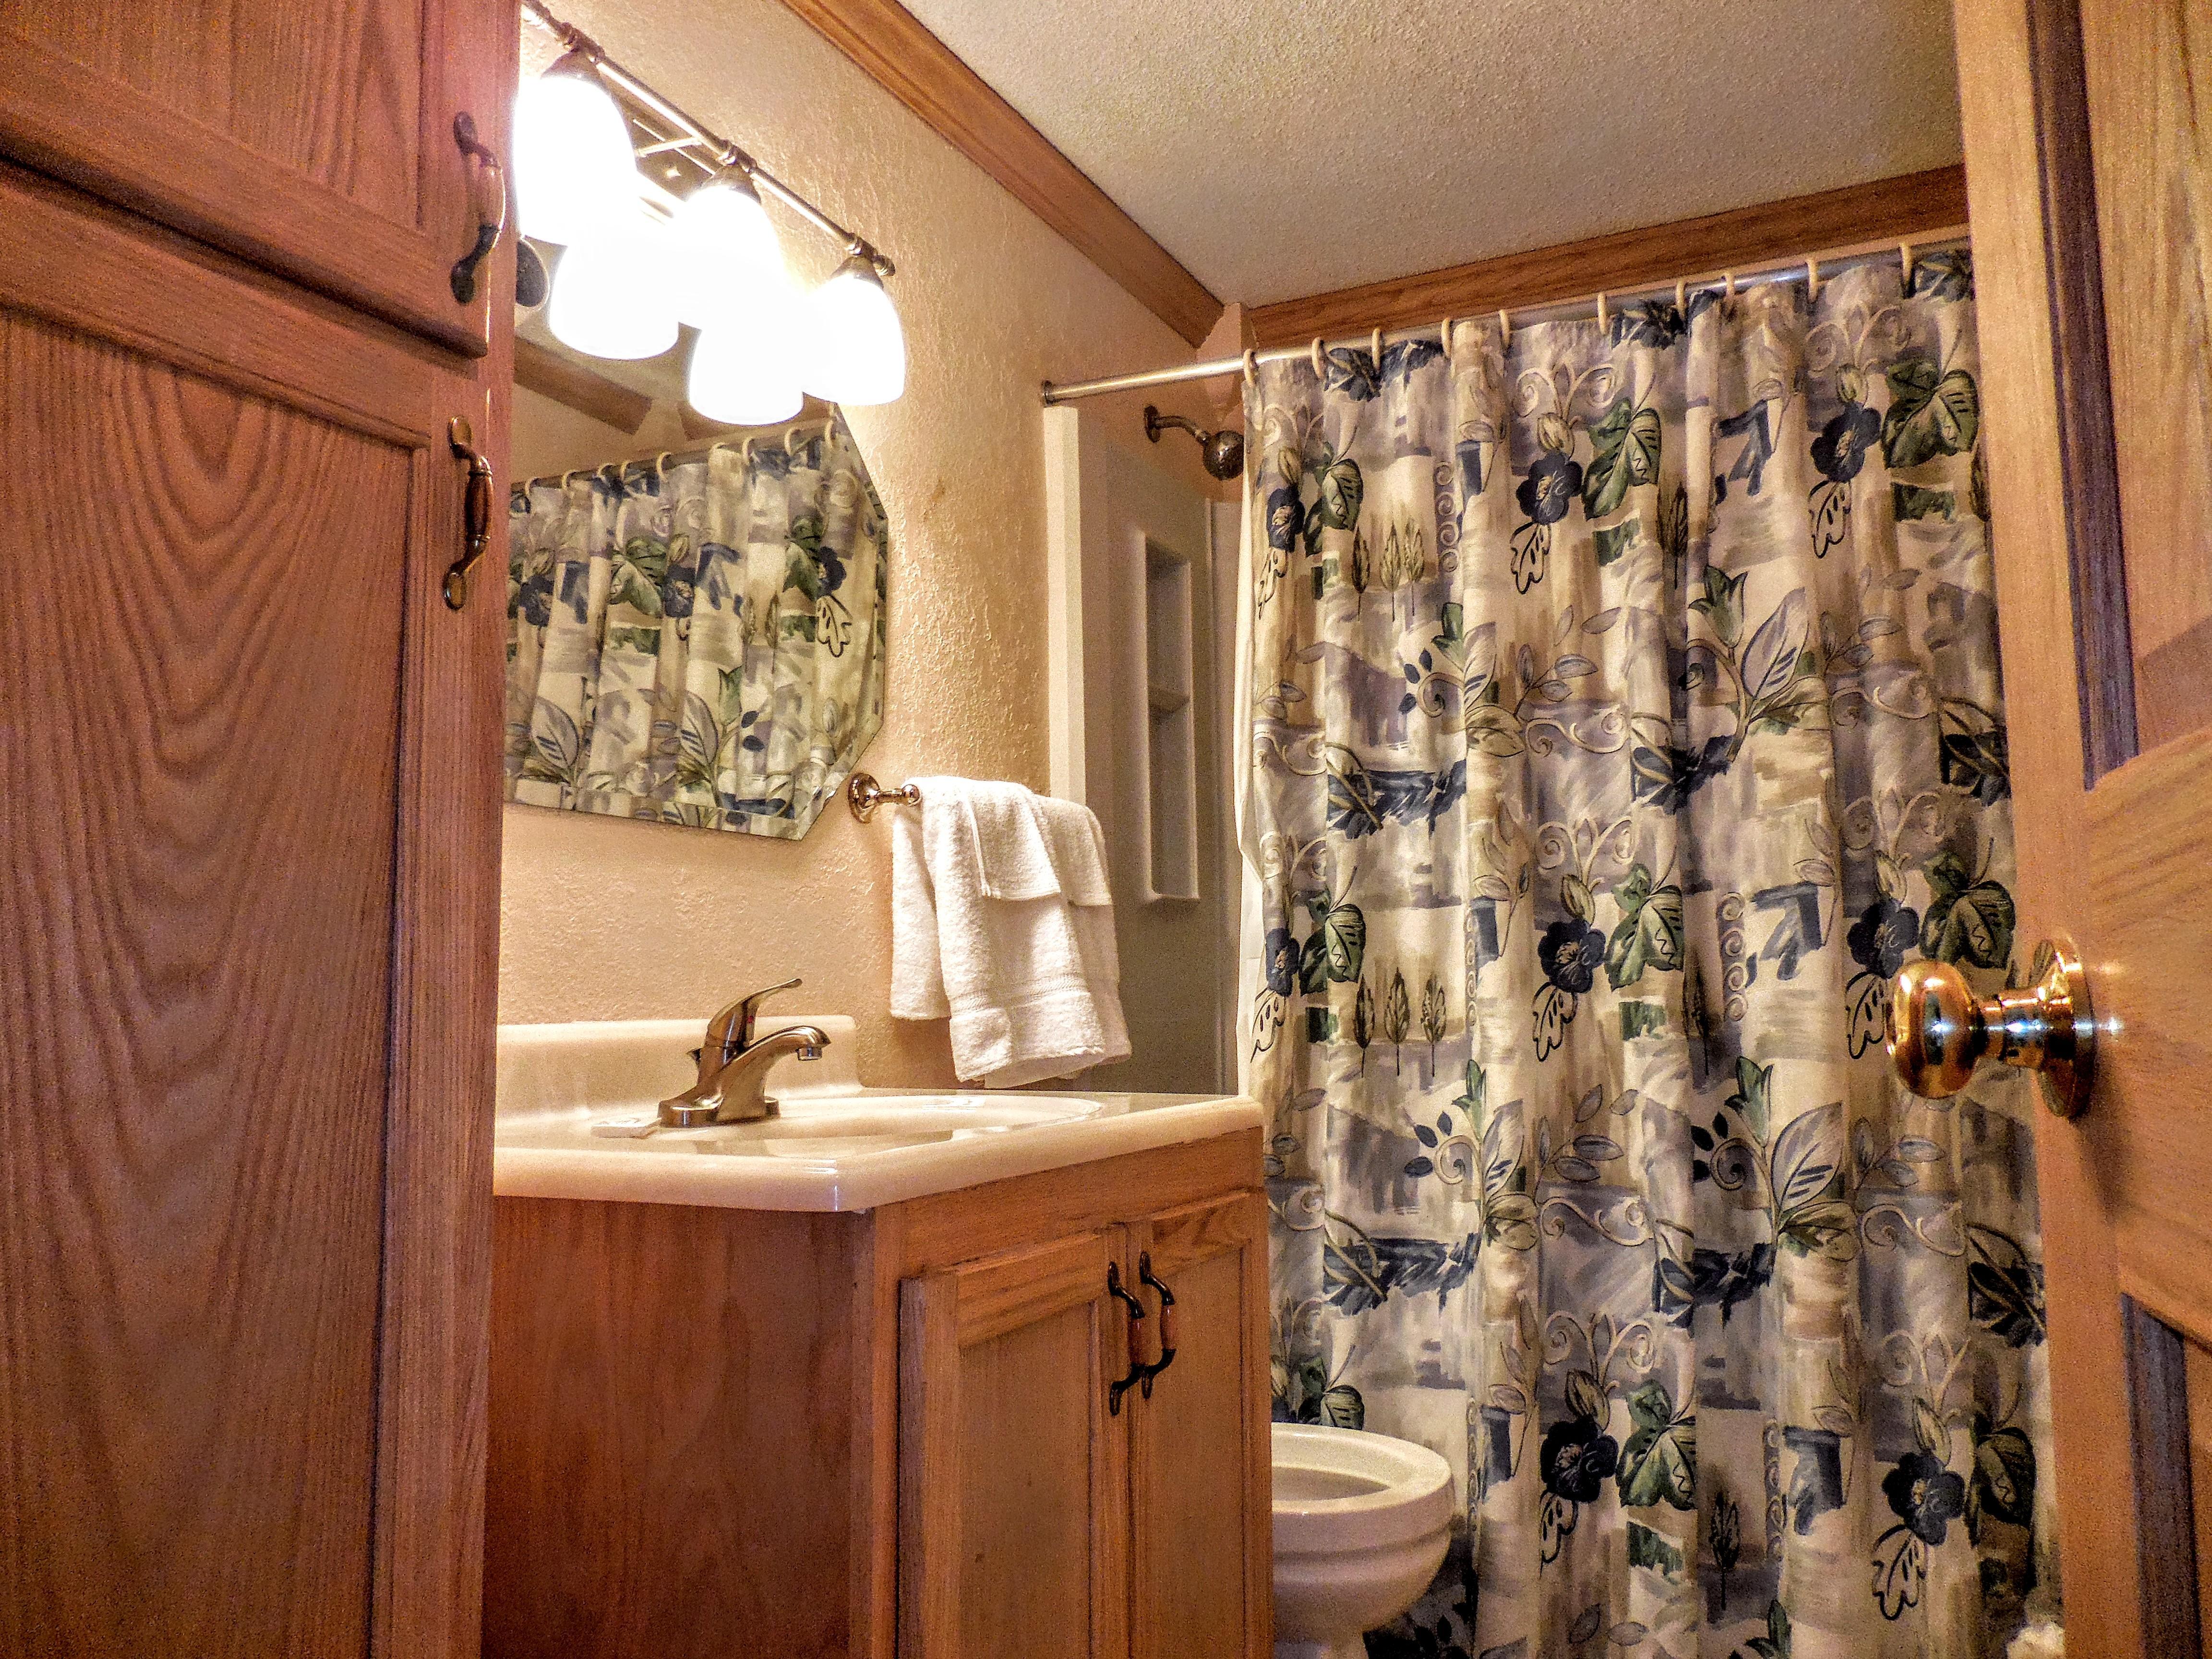 Hallway bathroom includes tub and shower